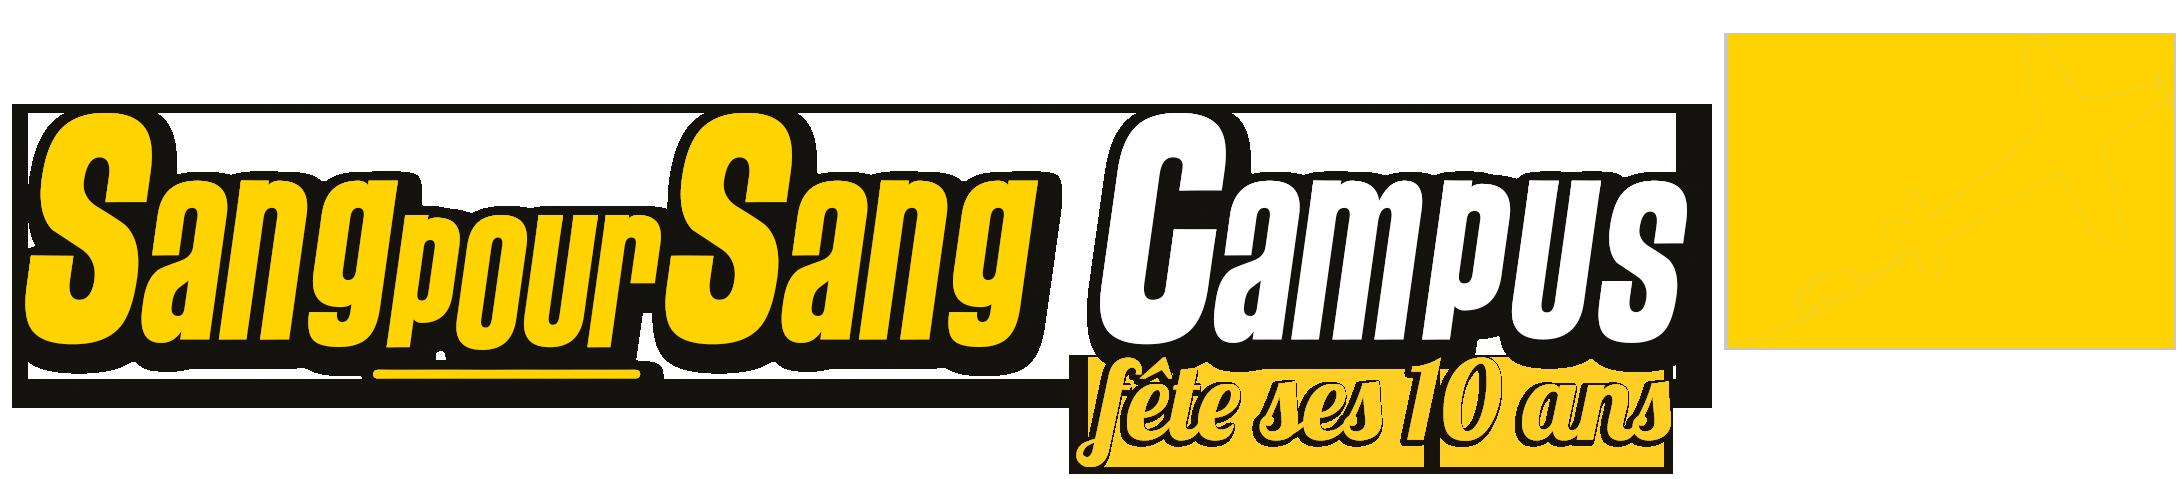 Sang Pour Sang Campus